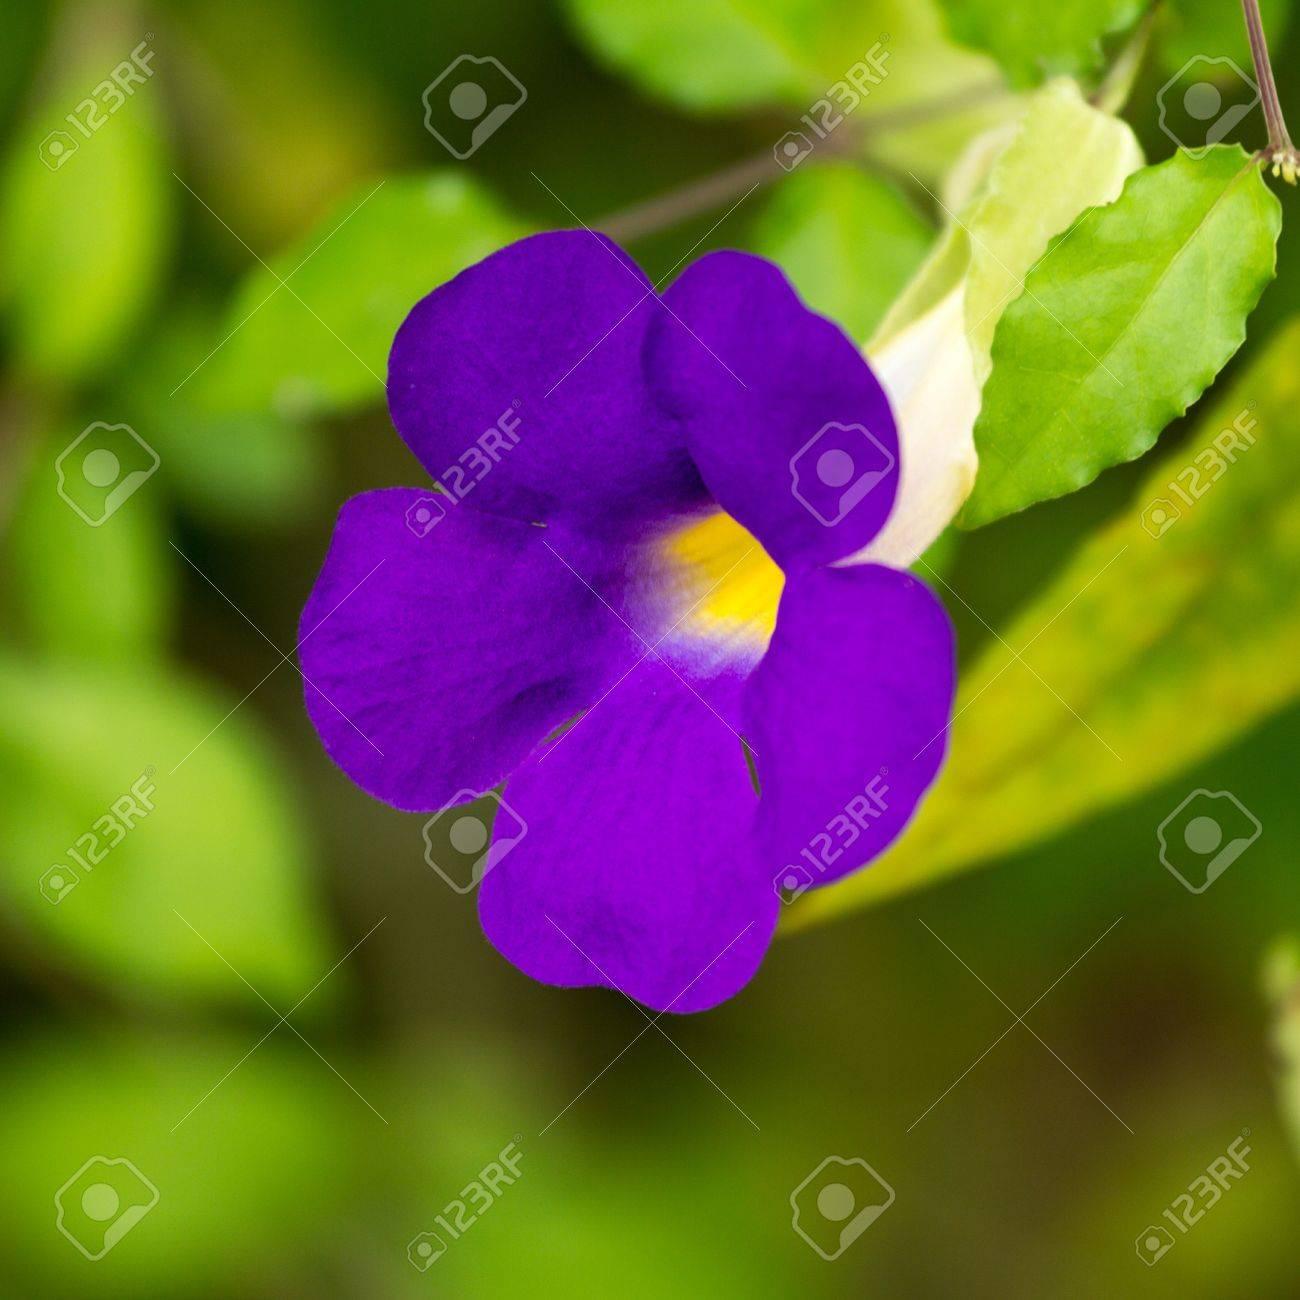 purple flowers grow beautiful house plants stock photo 21905323